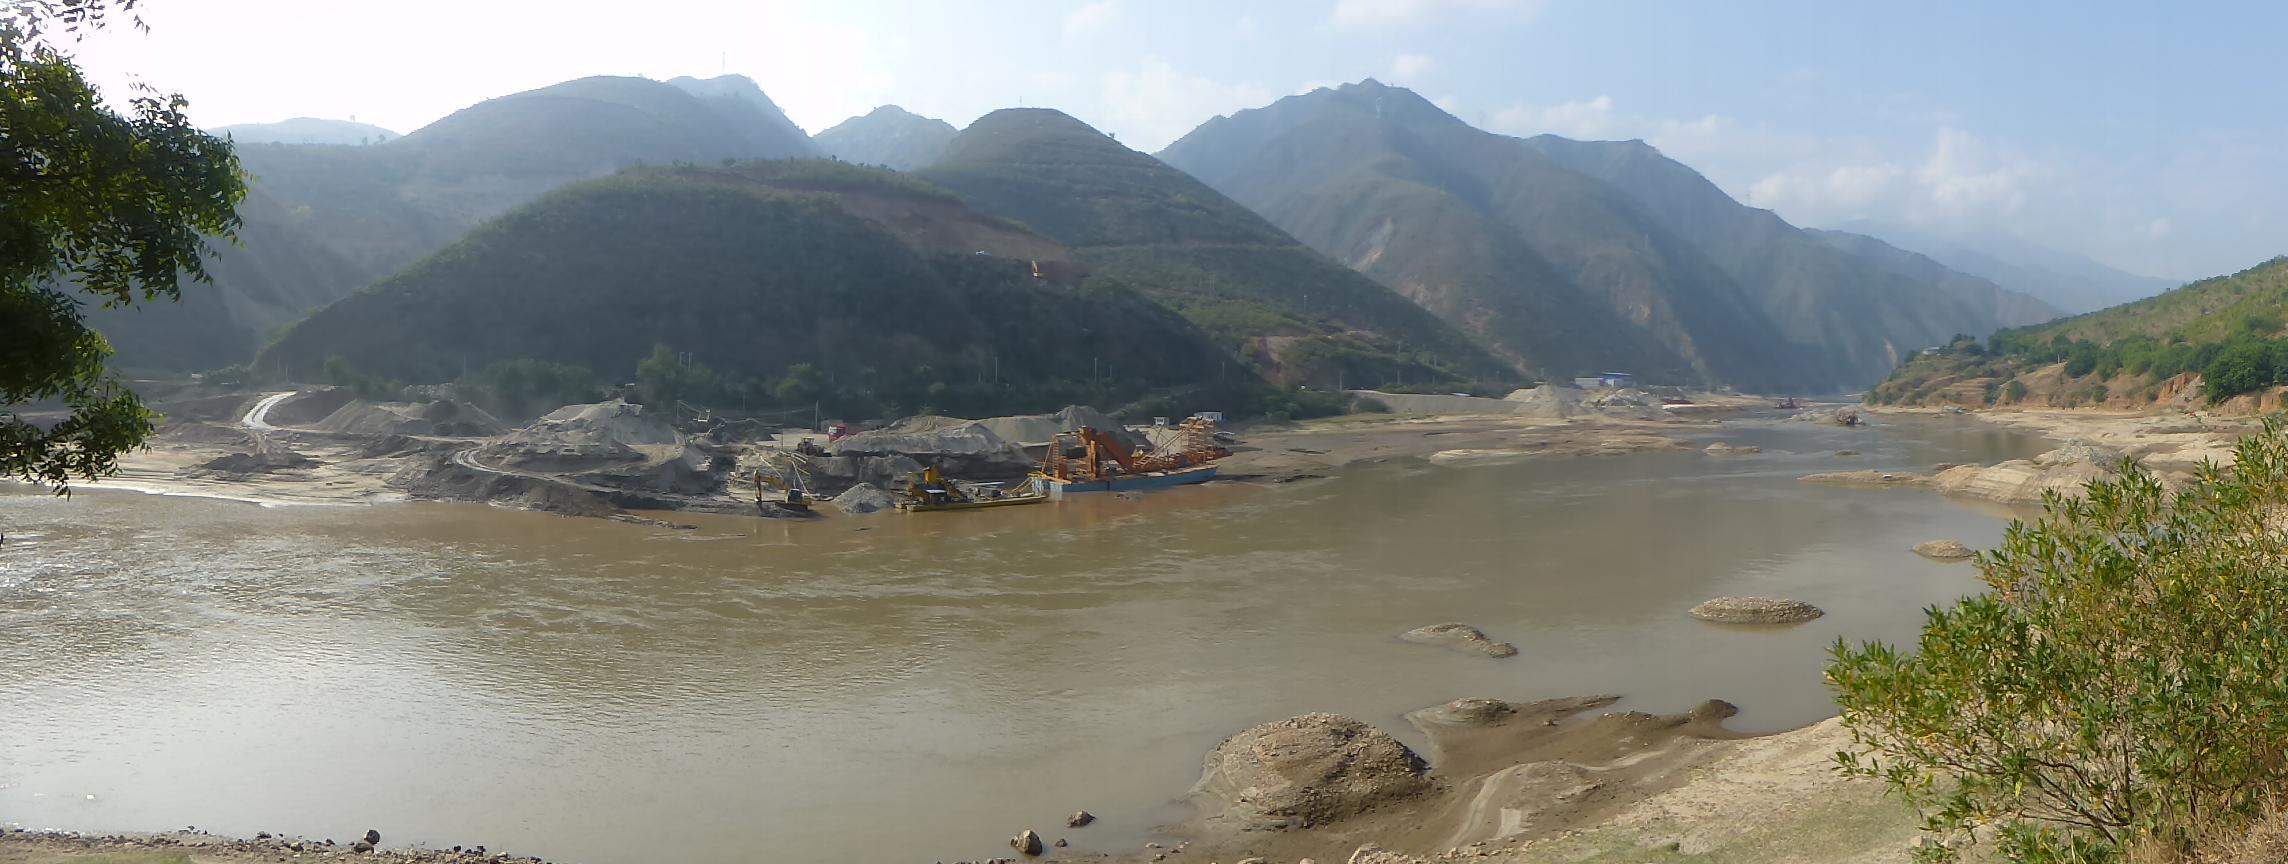 Description: The Red River near the Yunnan city of Gejiu (image credit Wikipedia)